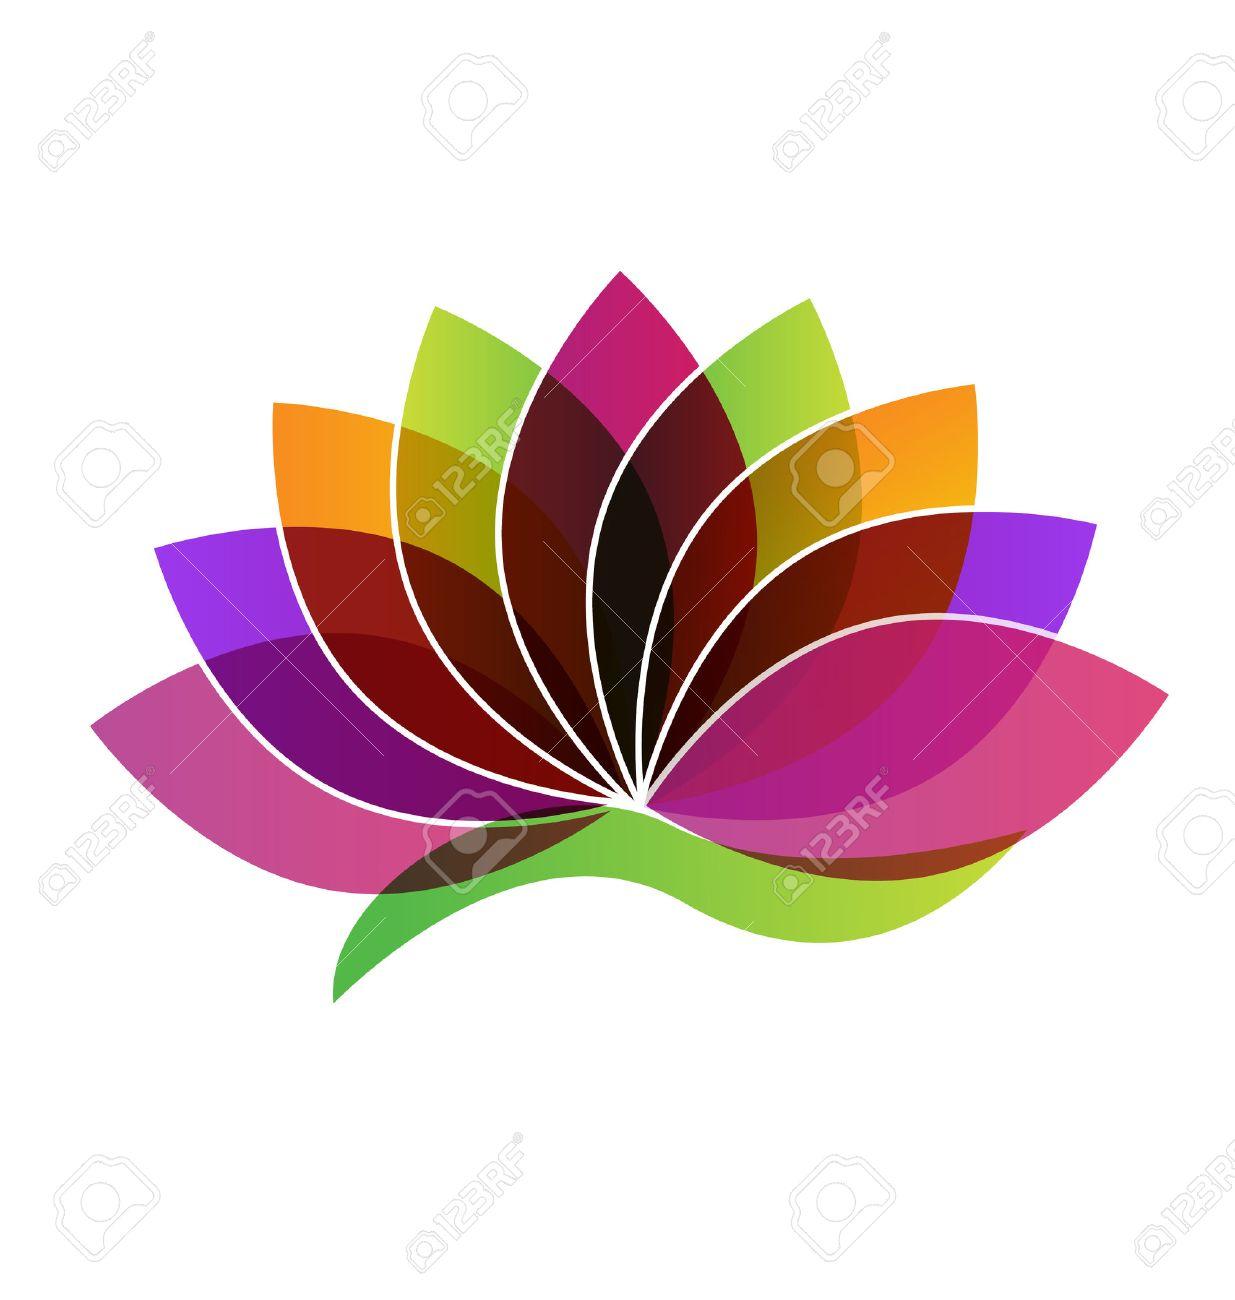 Lotus flower identity card logo vector royalty free cliparts lotus flower identity card logo vector stock vector 46222998 mightylinksfo